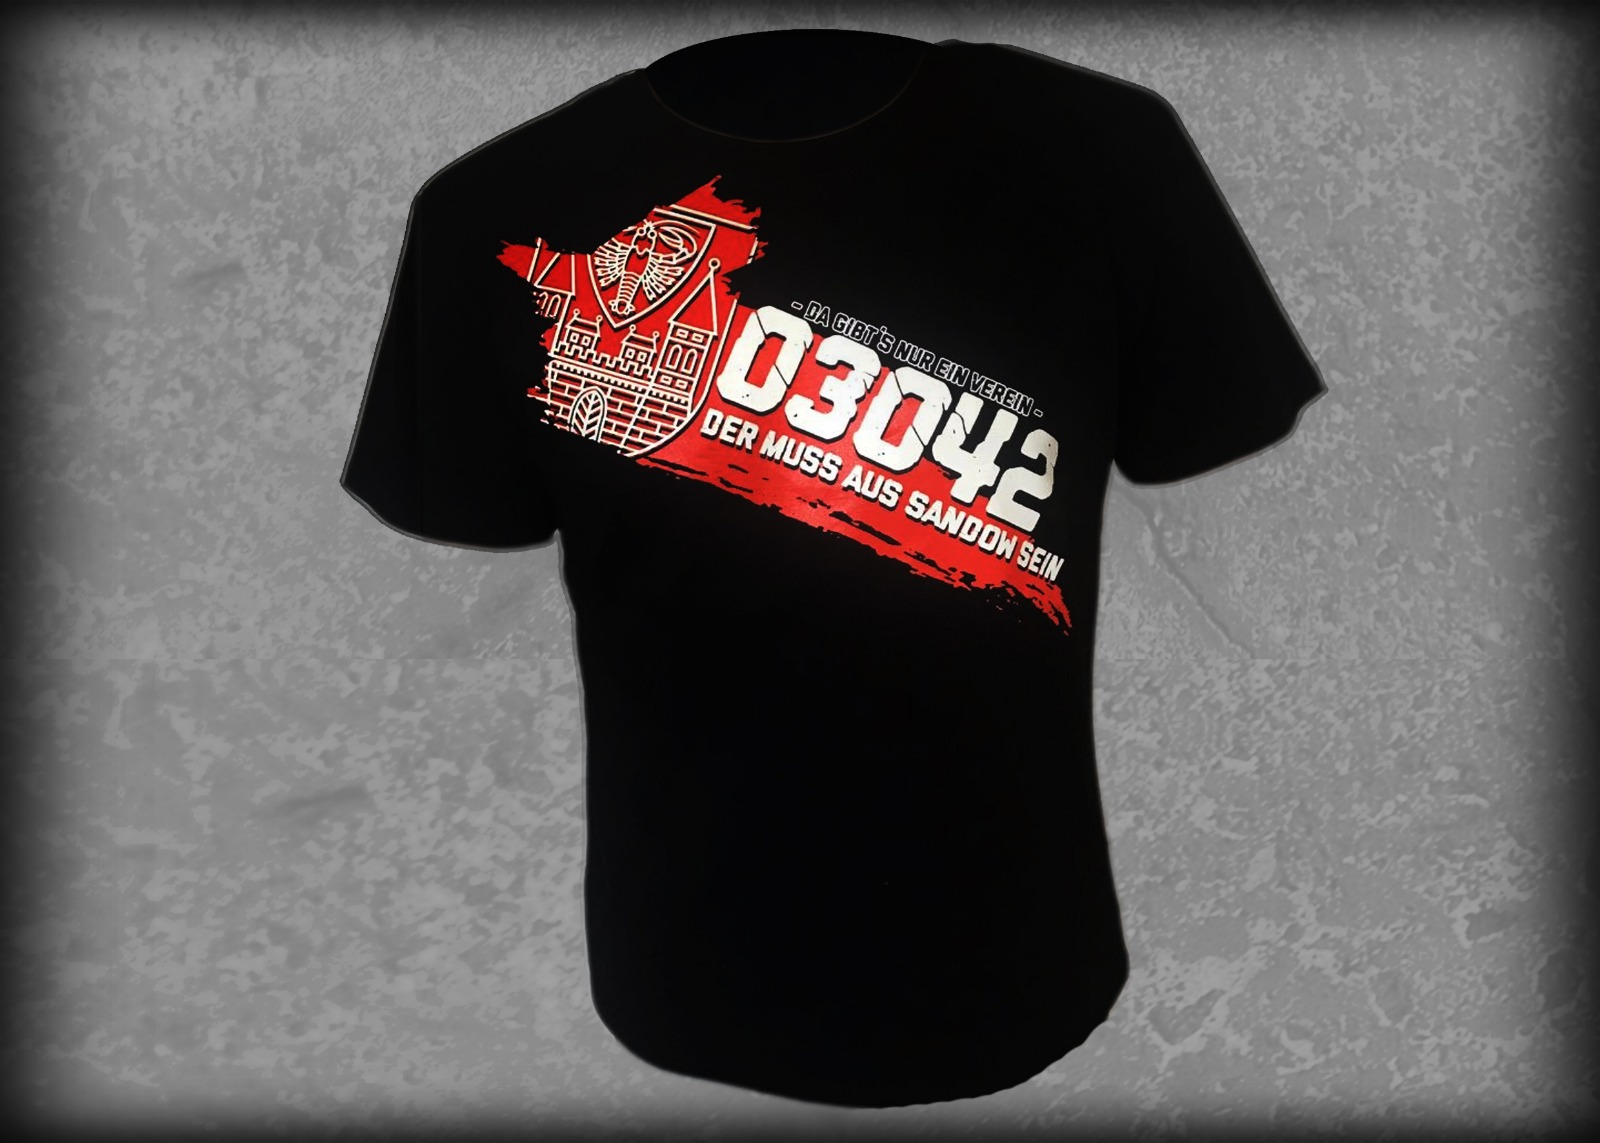 03042-Shirt Image